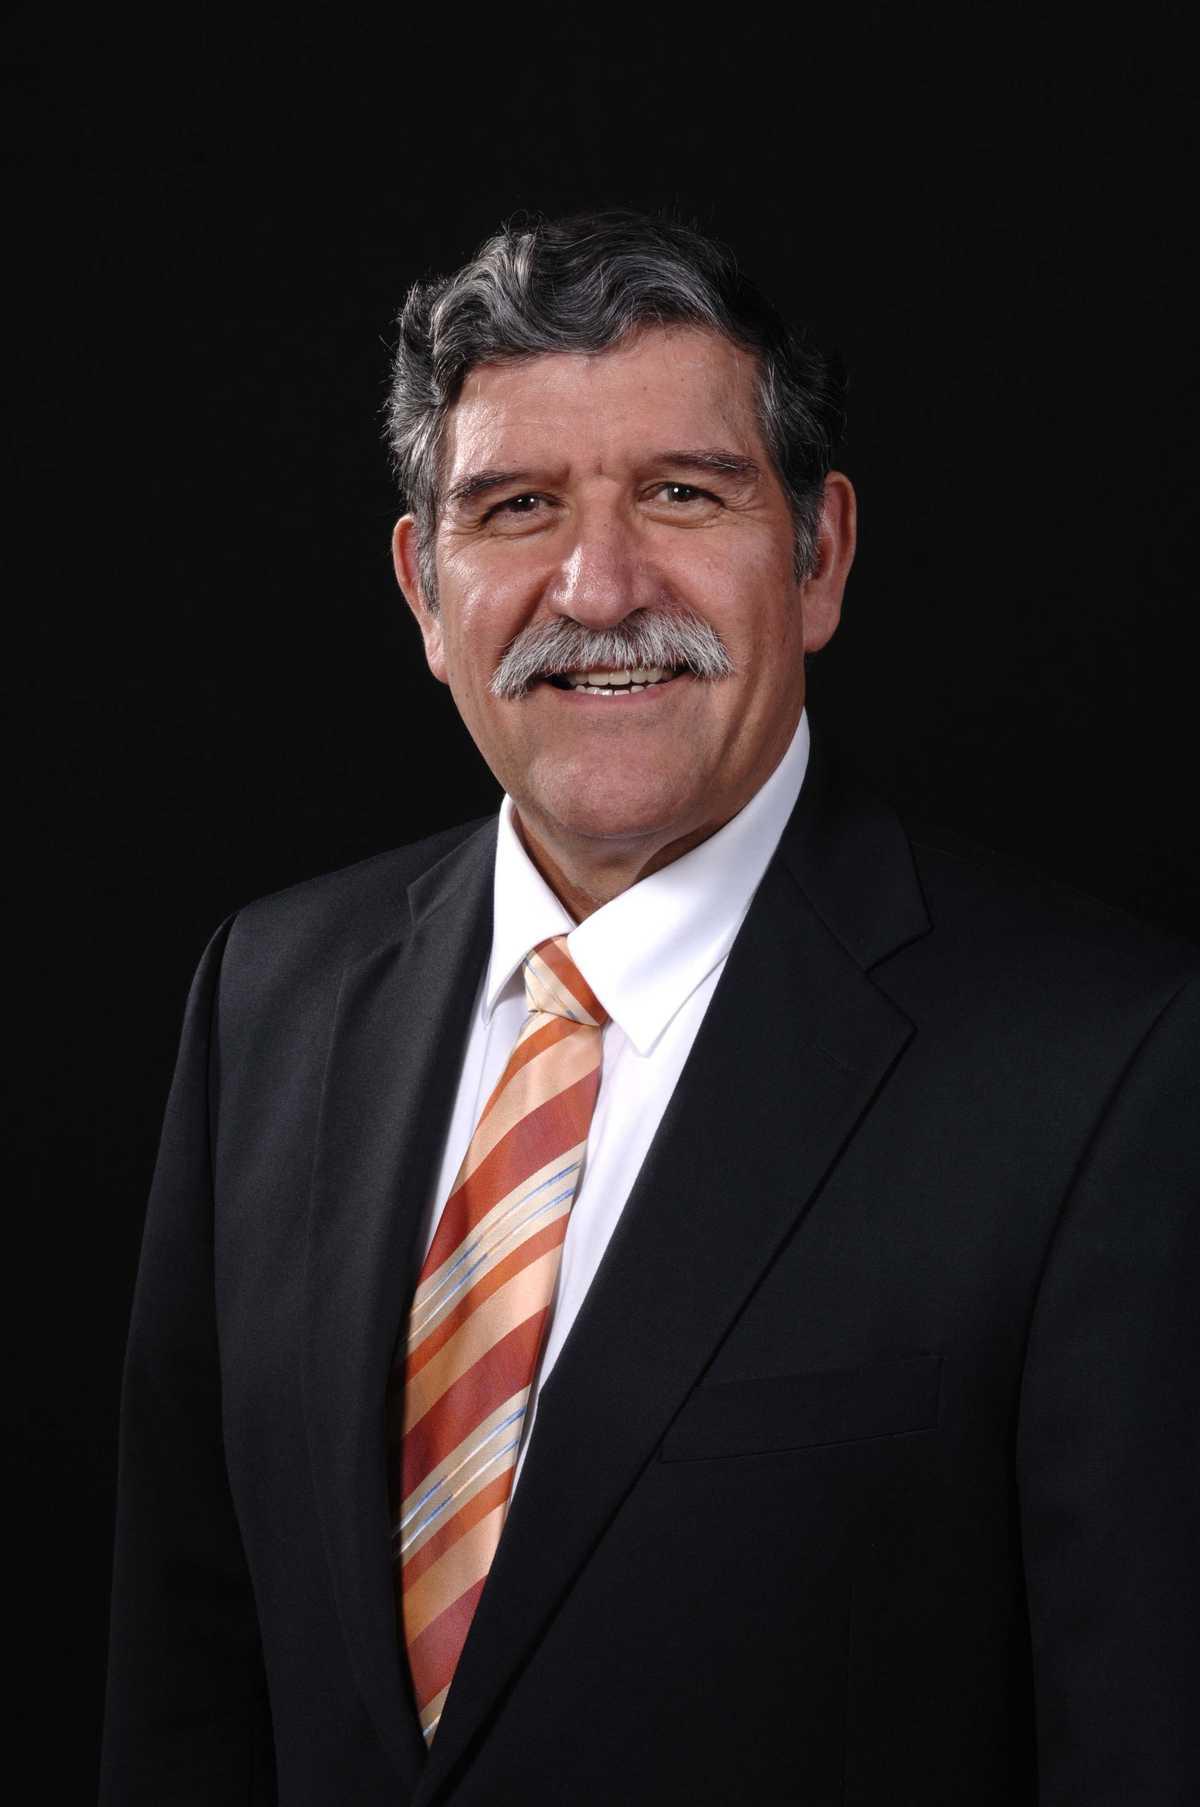 Dr. Ricardo Romo Vice Chairman, Board of Directors